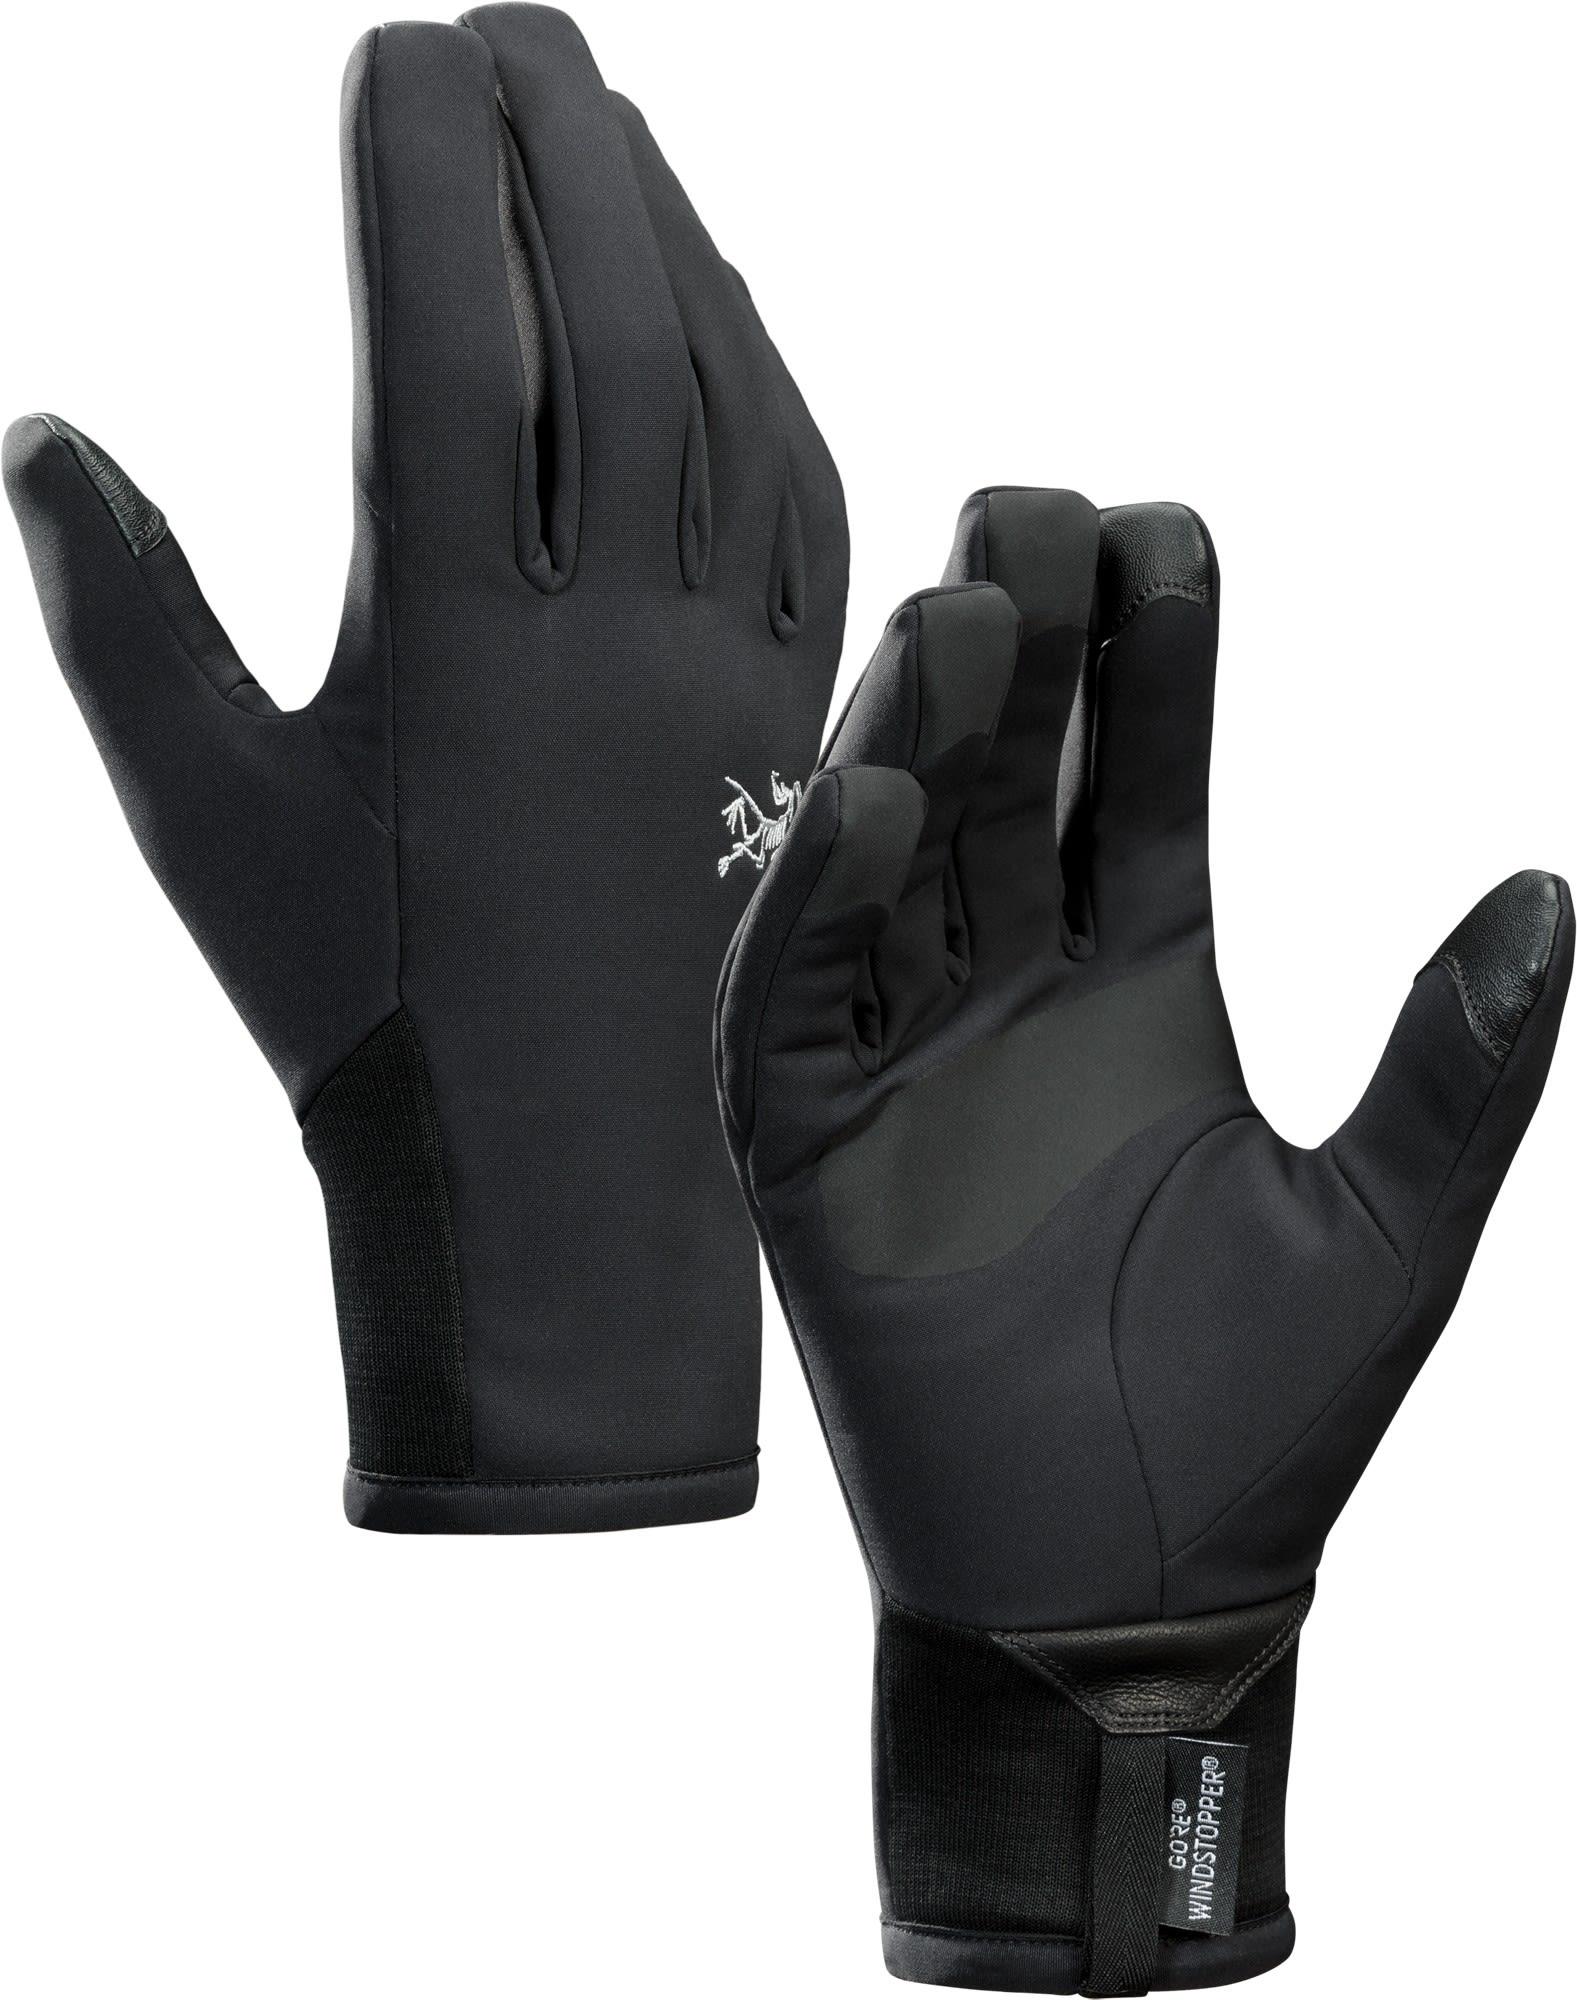 Arcteryx Venta Glove Schwarz, Accessoires, L